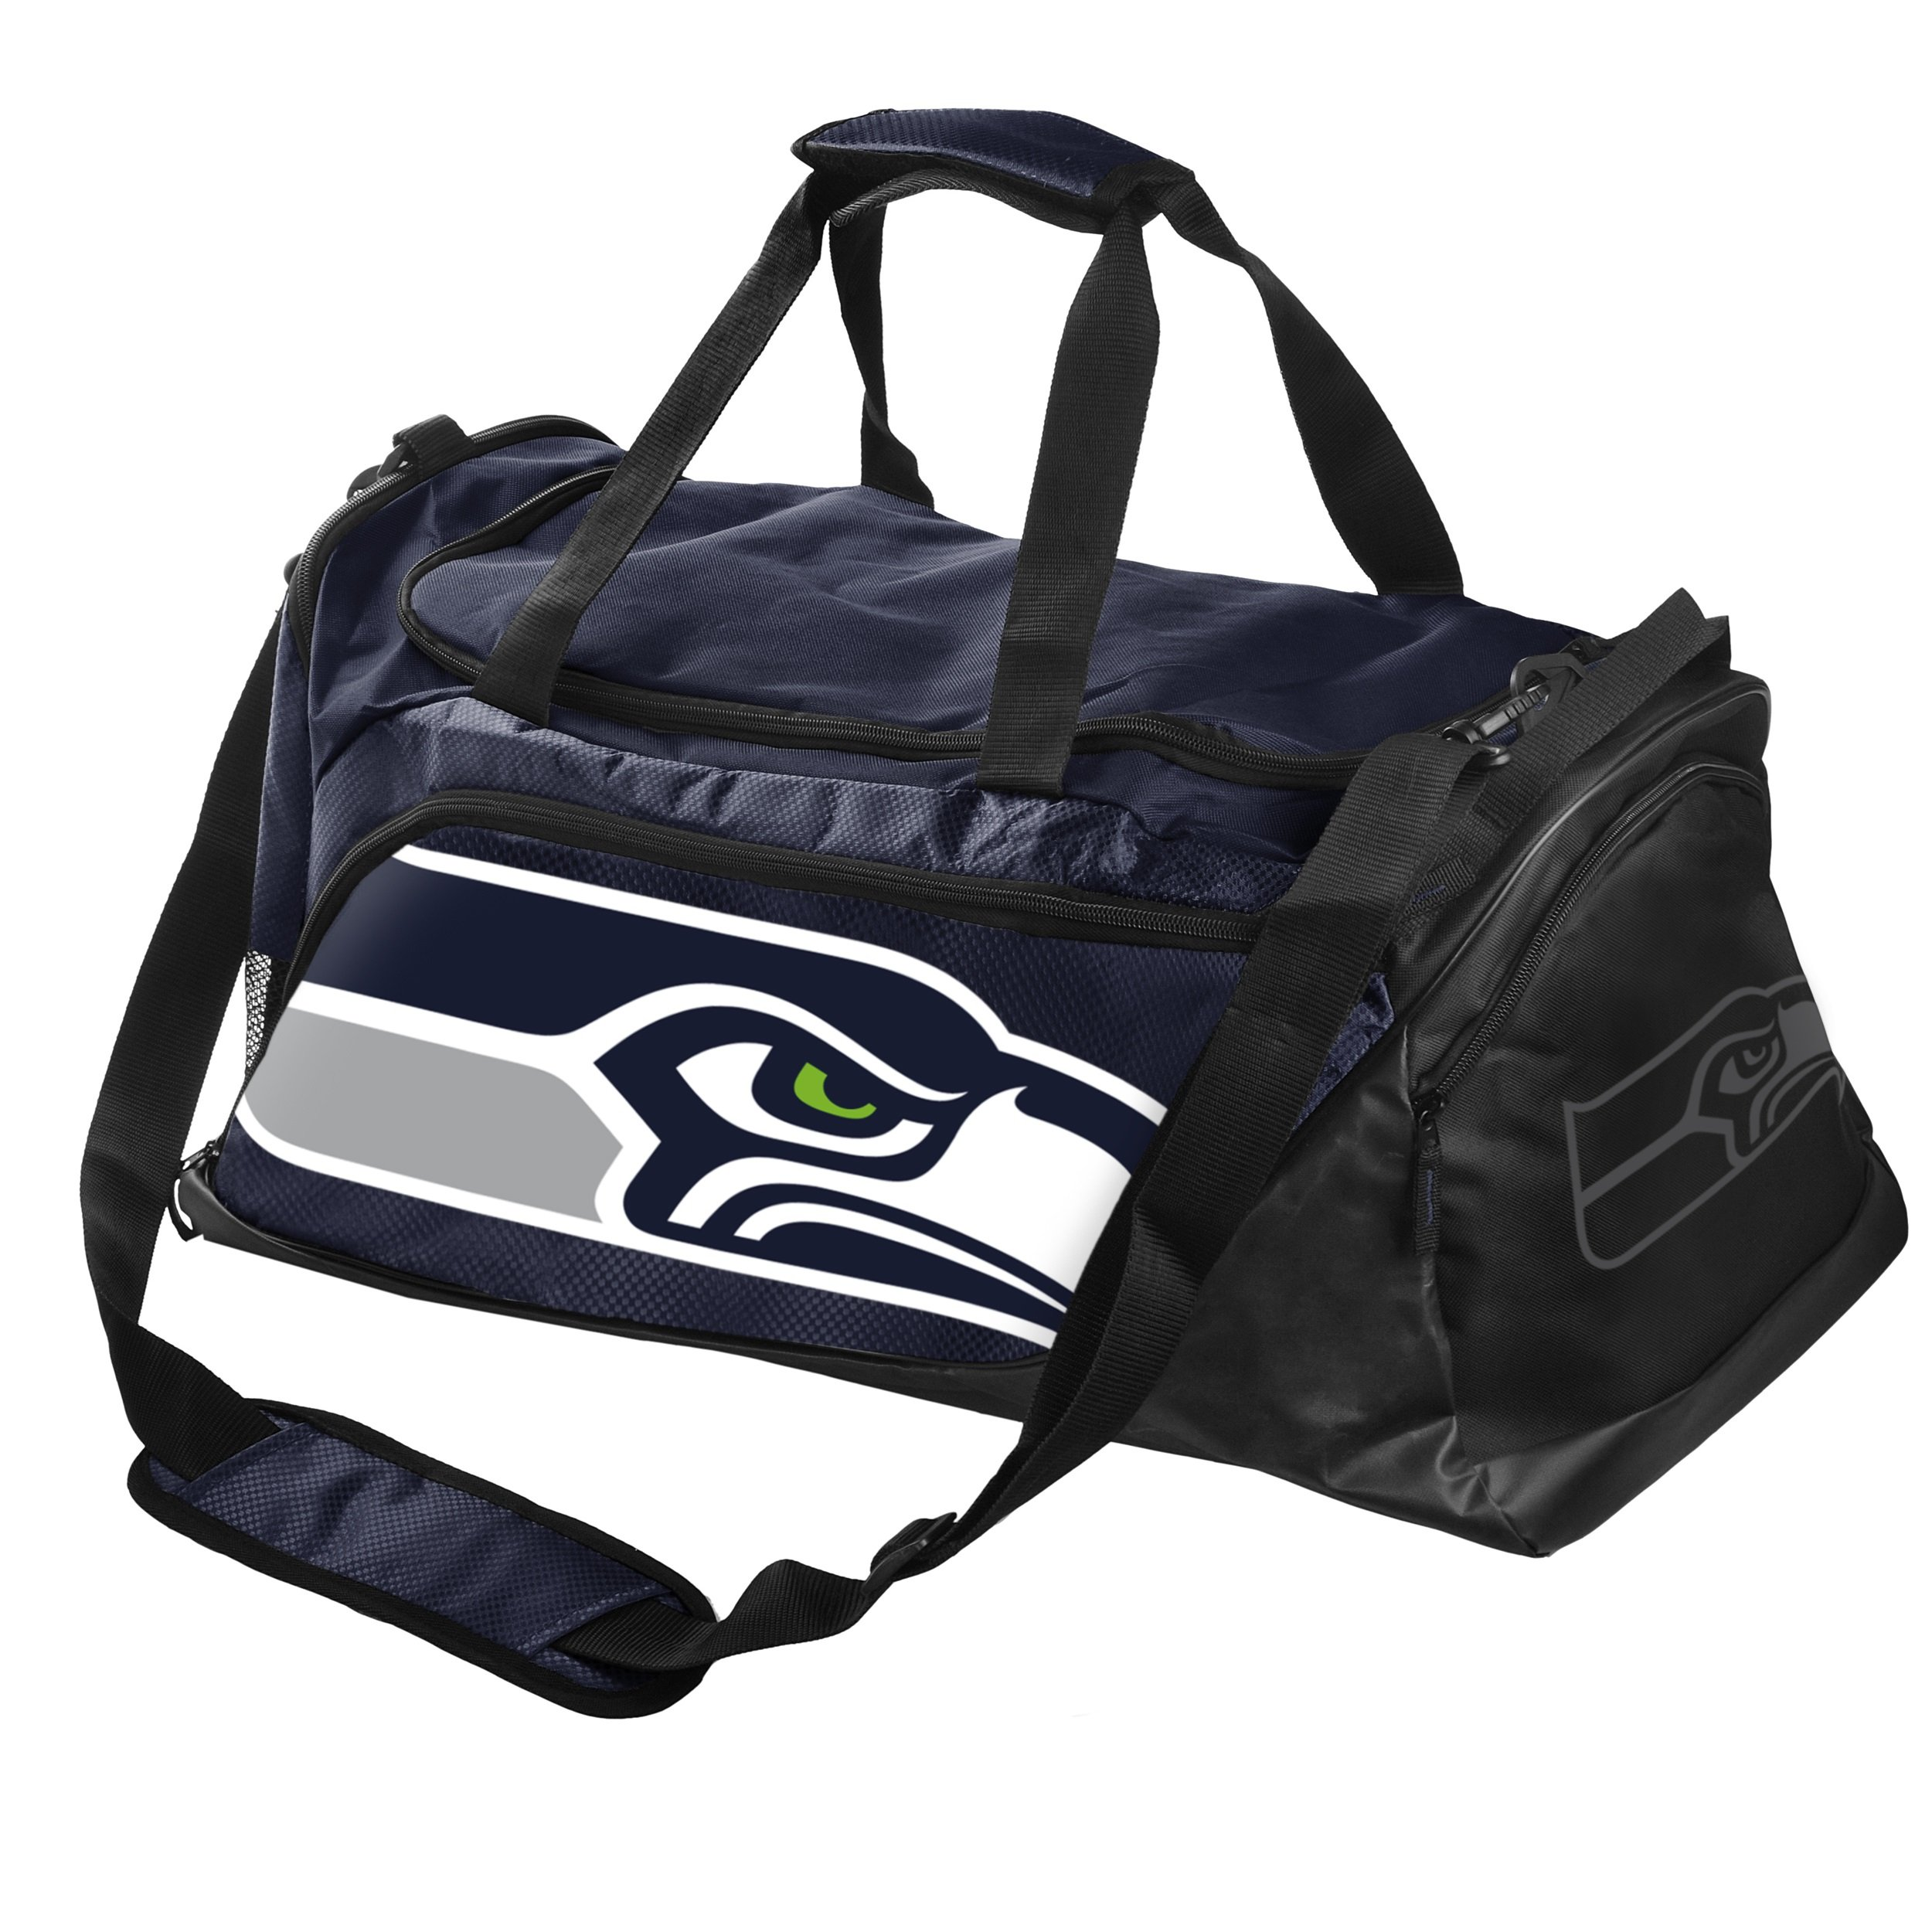 FOCO Seattle Seahawks Locker Room Collection Duffle Bag - Medium